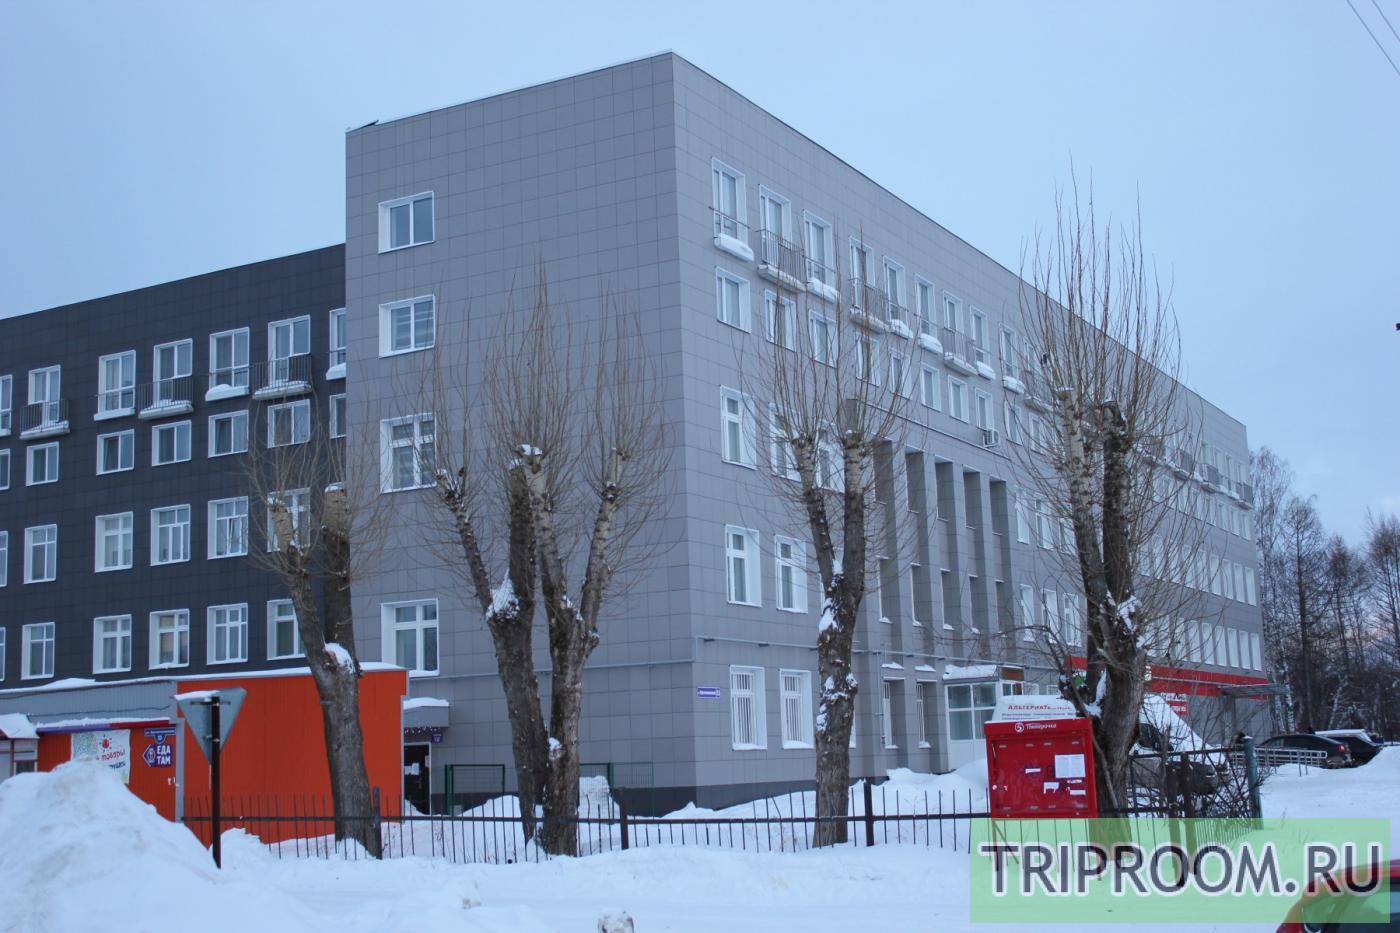 1-комнатная квартира посуточно (вариант № 34045), ул. Краснознаменная улица, фото № 16